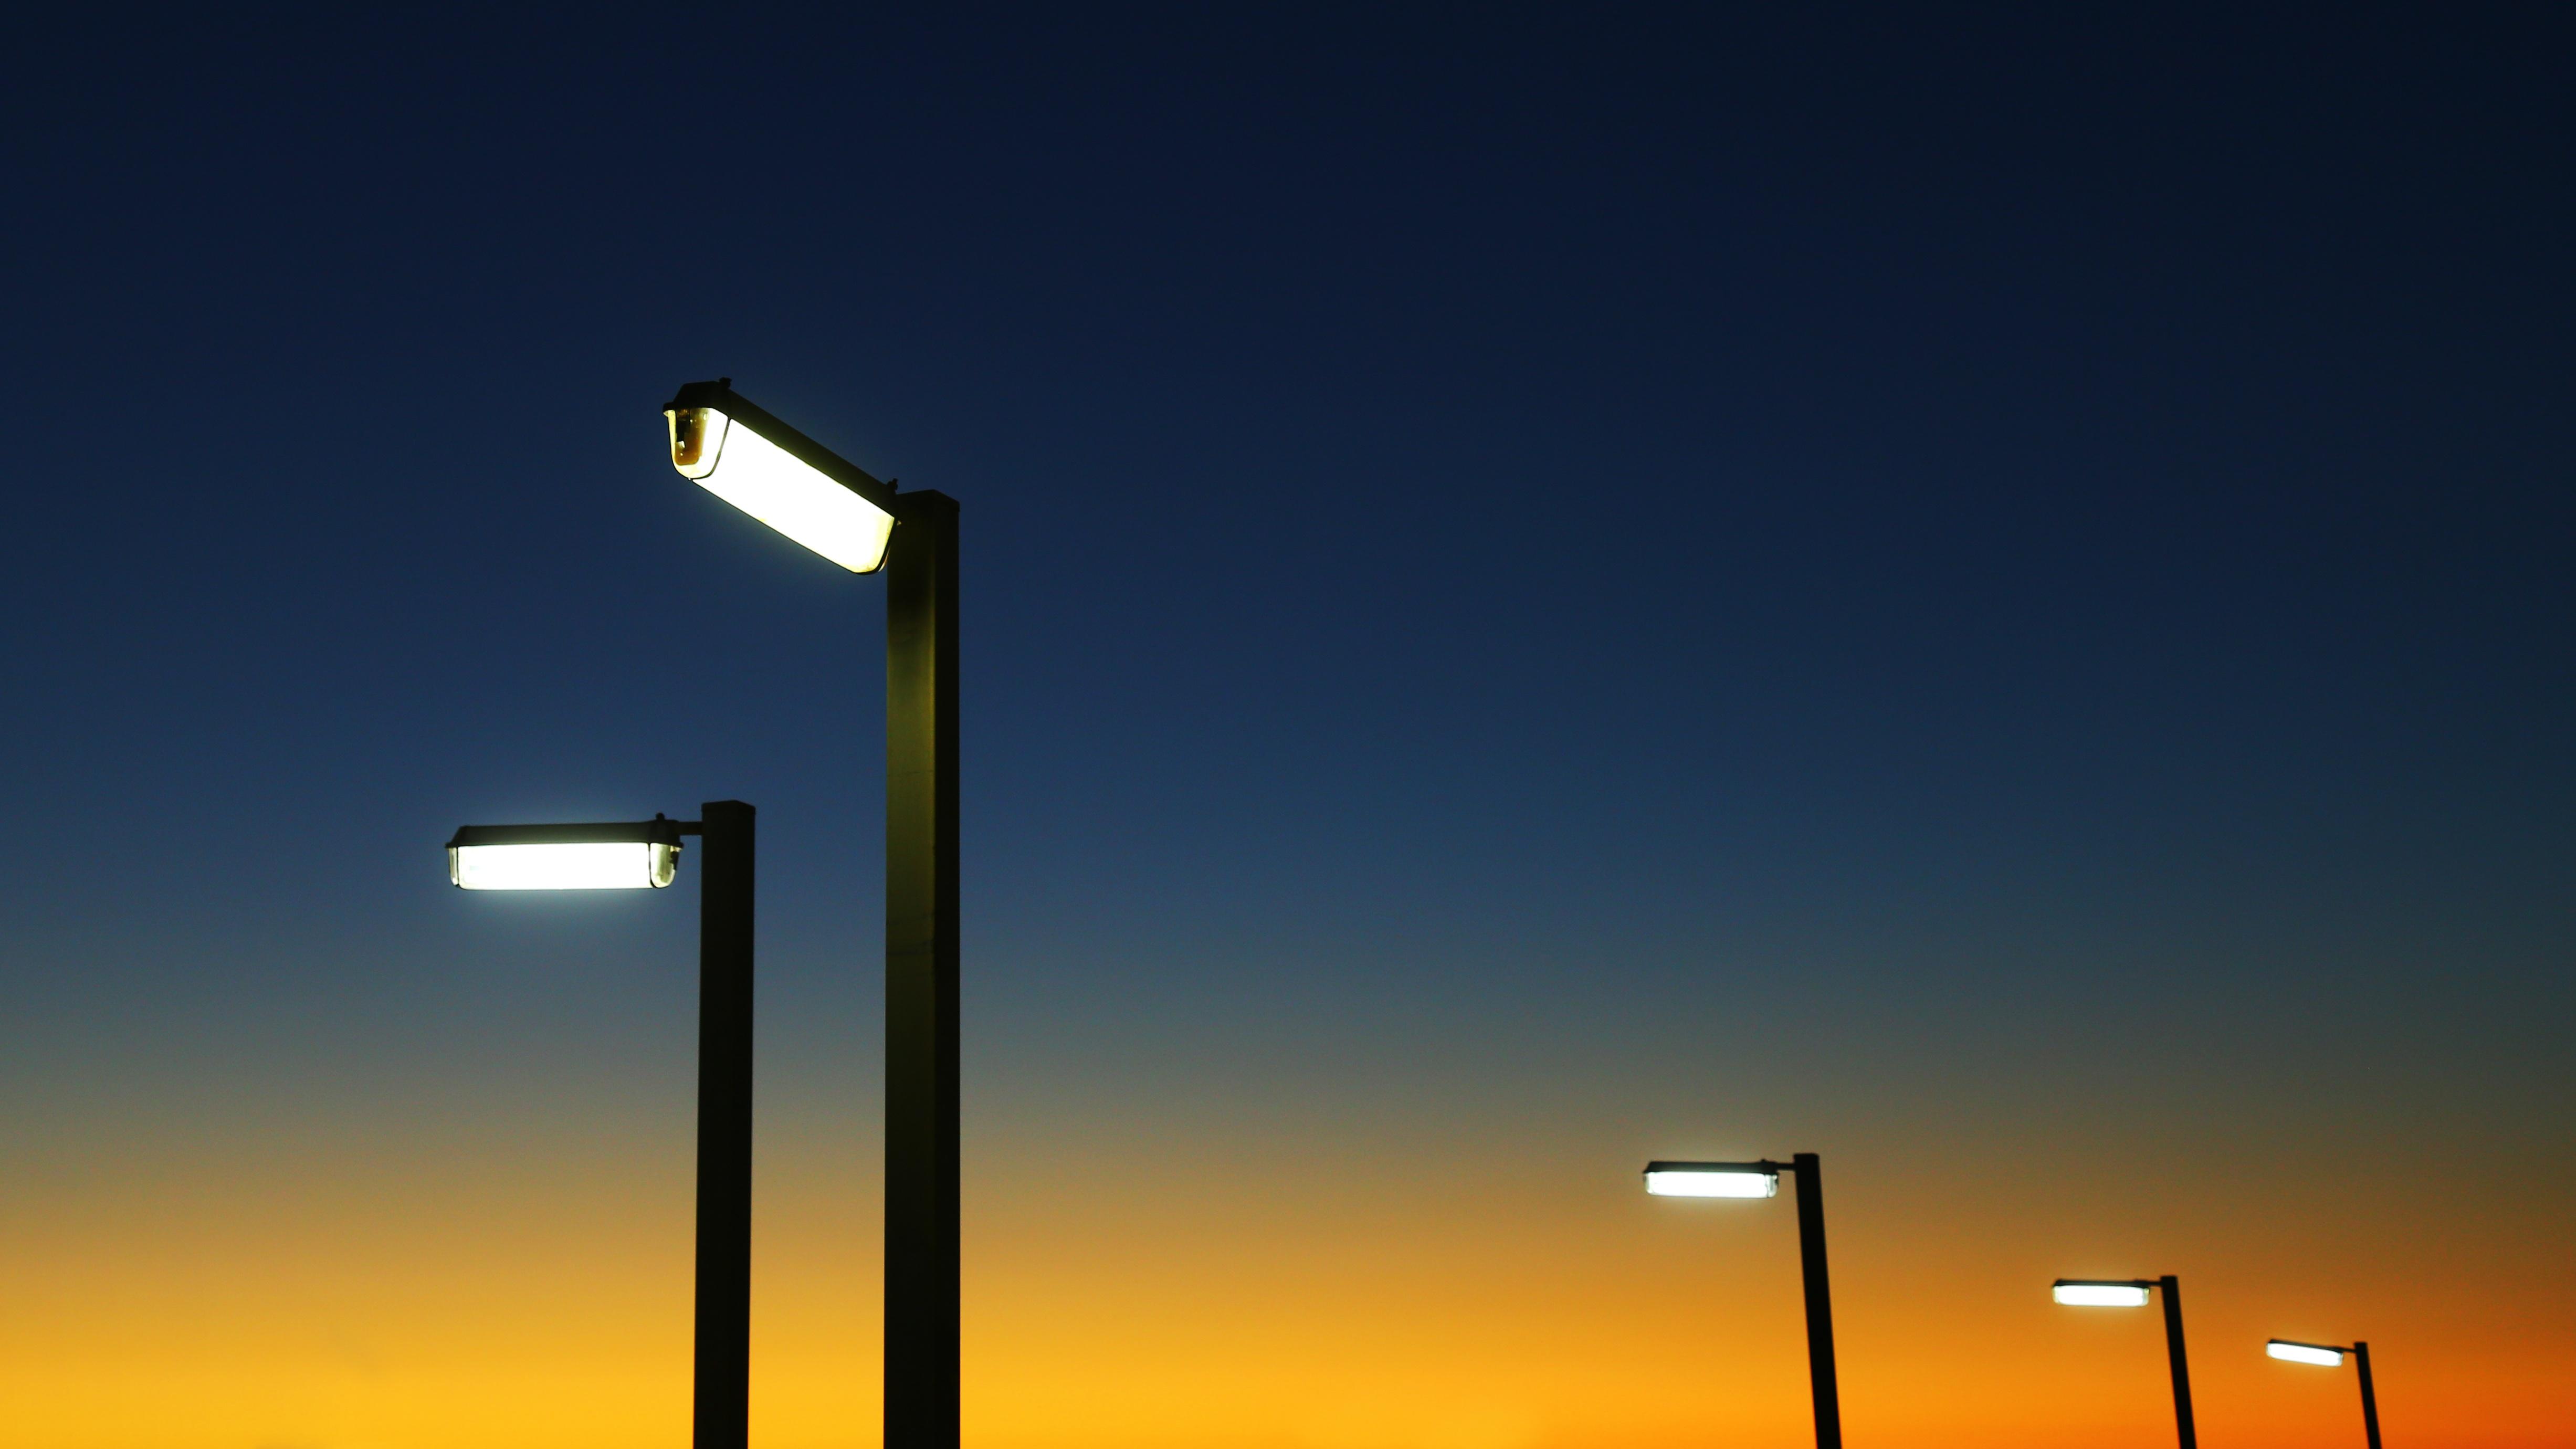 Street lights, Dark, Lamp, Light, Road, HQ Photo